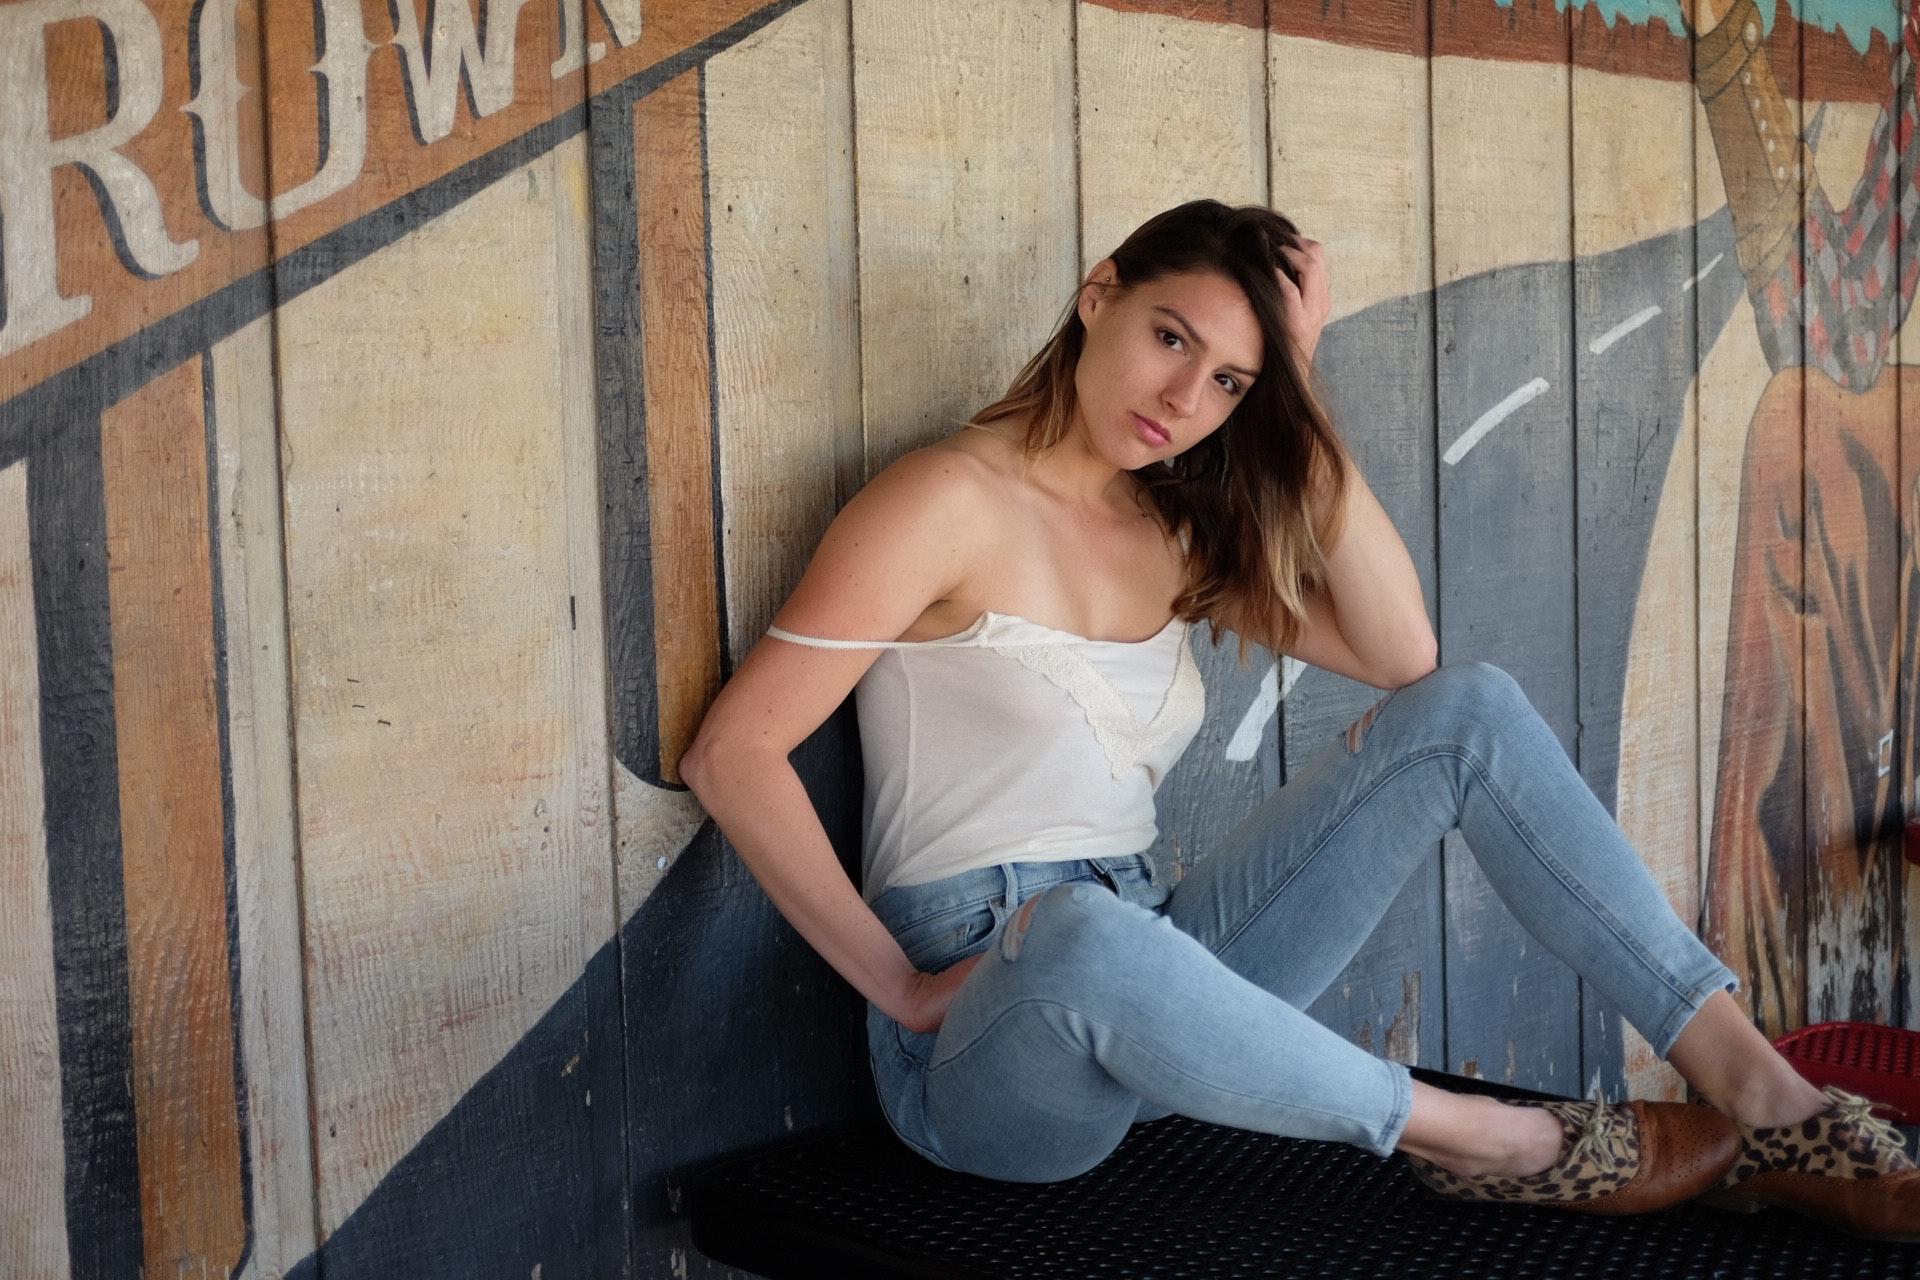 Amber Carollo's Model portfolio